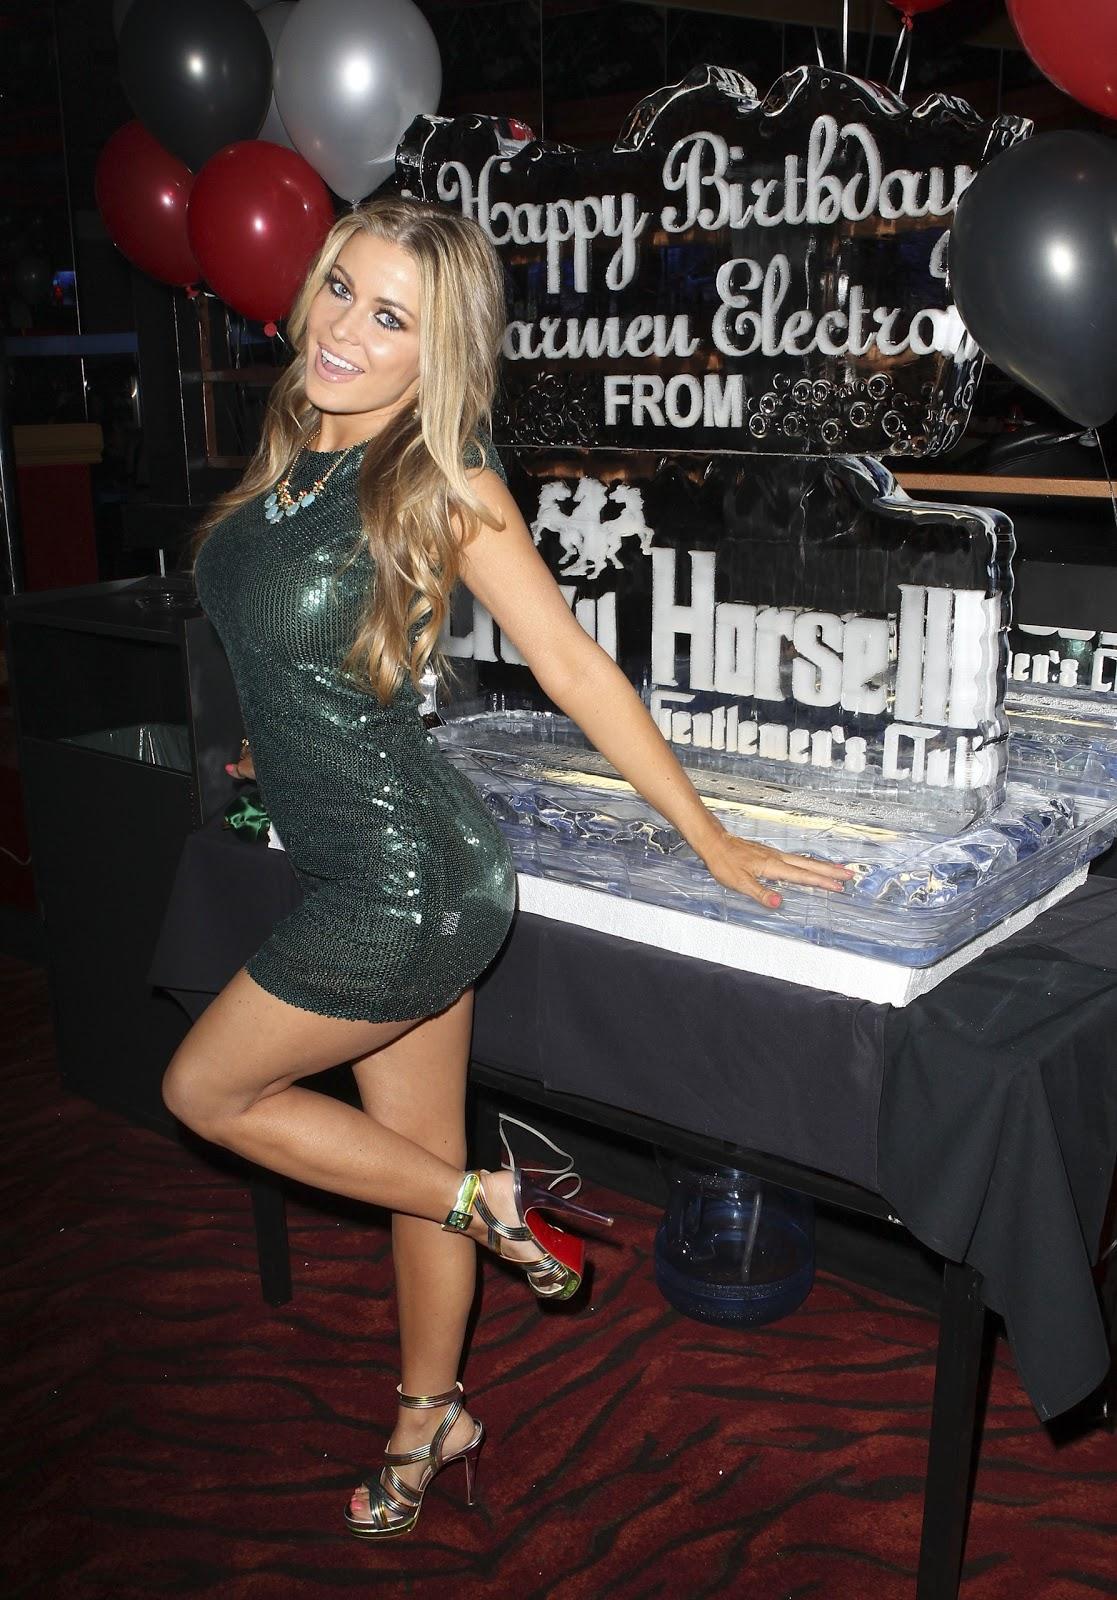 http://1.bp.blogspot.com/-Nx7RQ4TgUaE/T6_DAIvTz5I/AAAAAAAAANA/gONq0WF8Zqs/s1600/Carmen_Electra_Celebrating_her_40th_Birthday_at_the_Crazy_Horse_III_in_Las_Vegas_May_5_2012.jpg